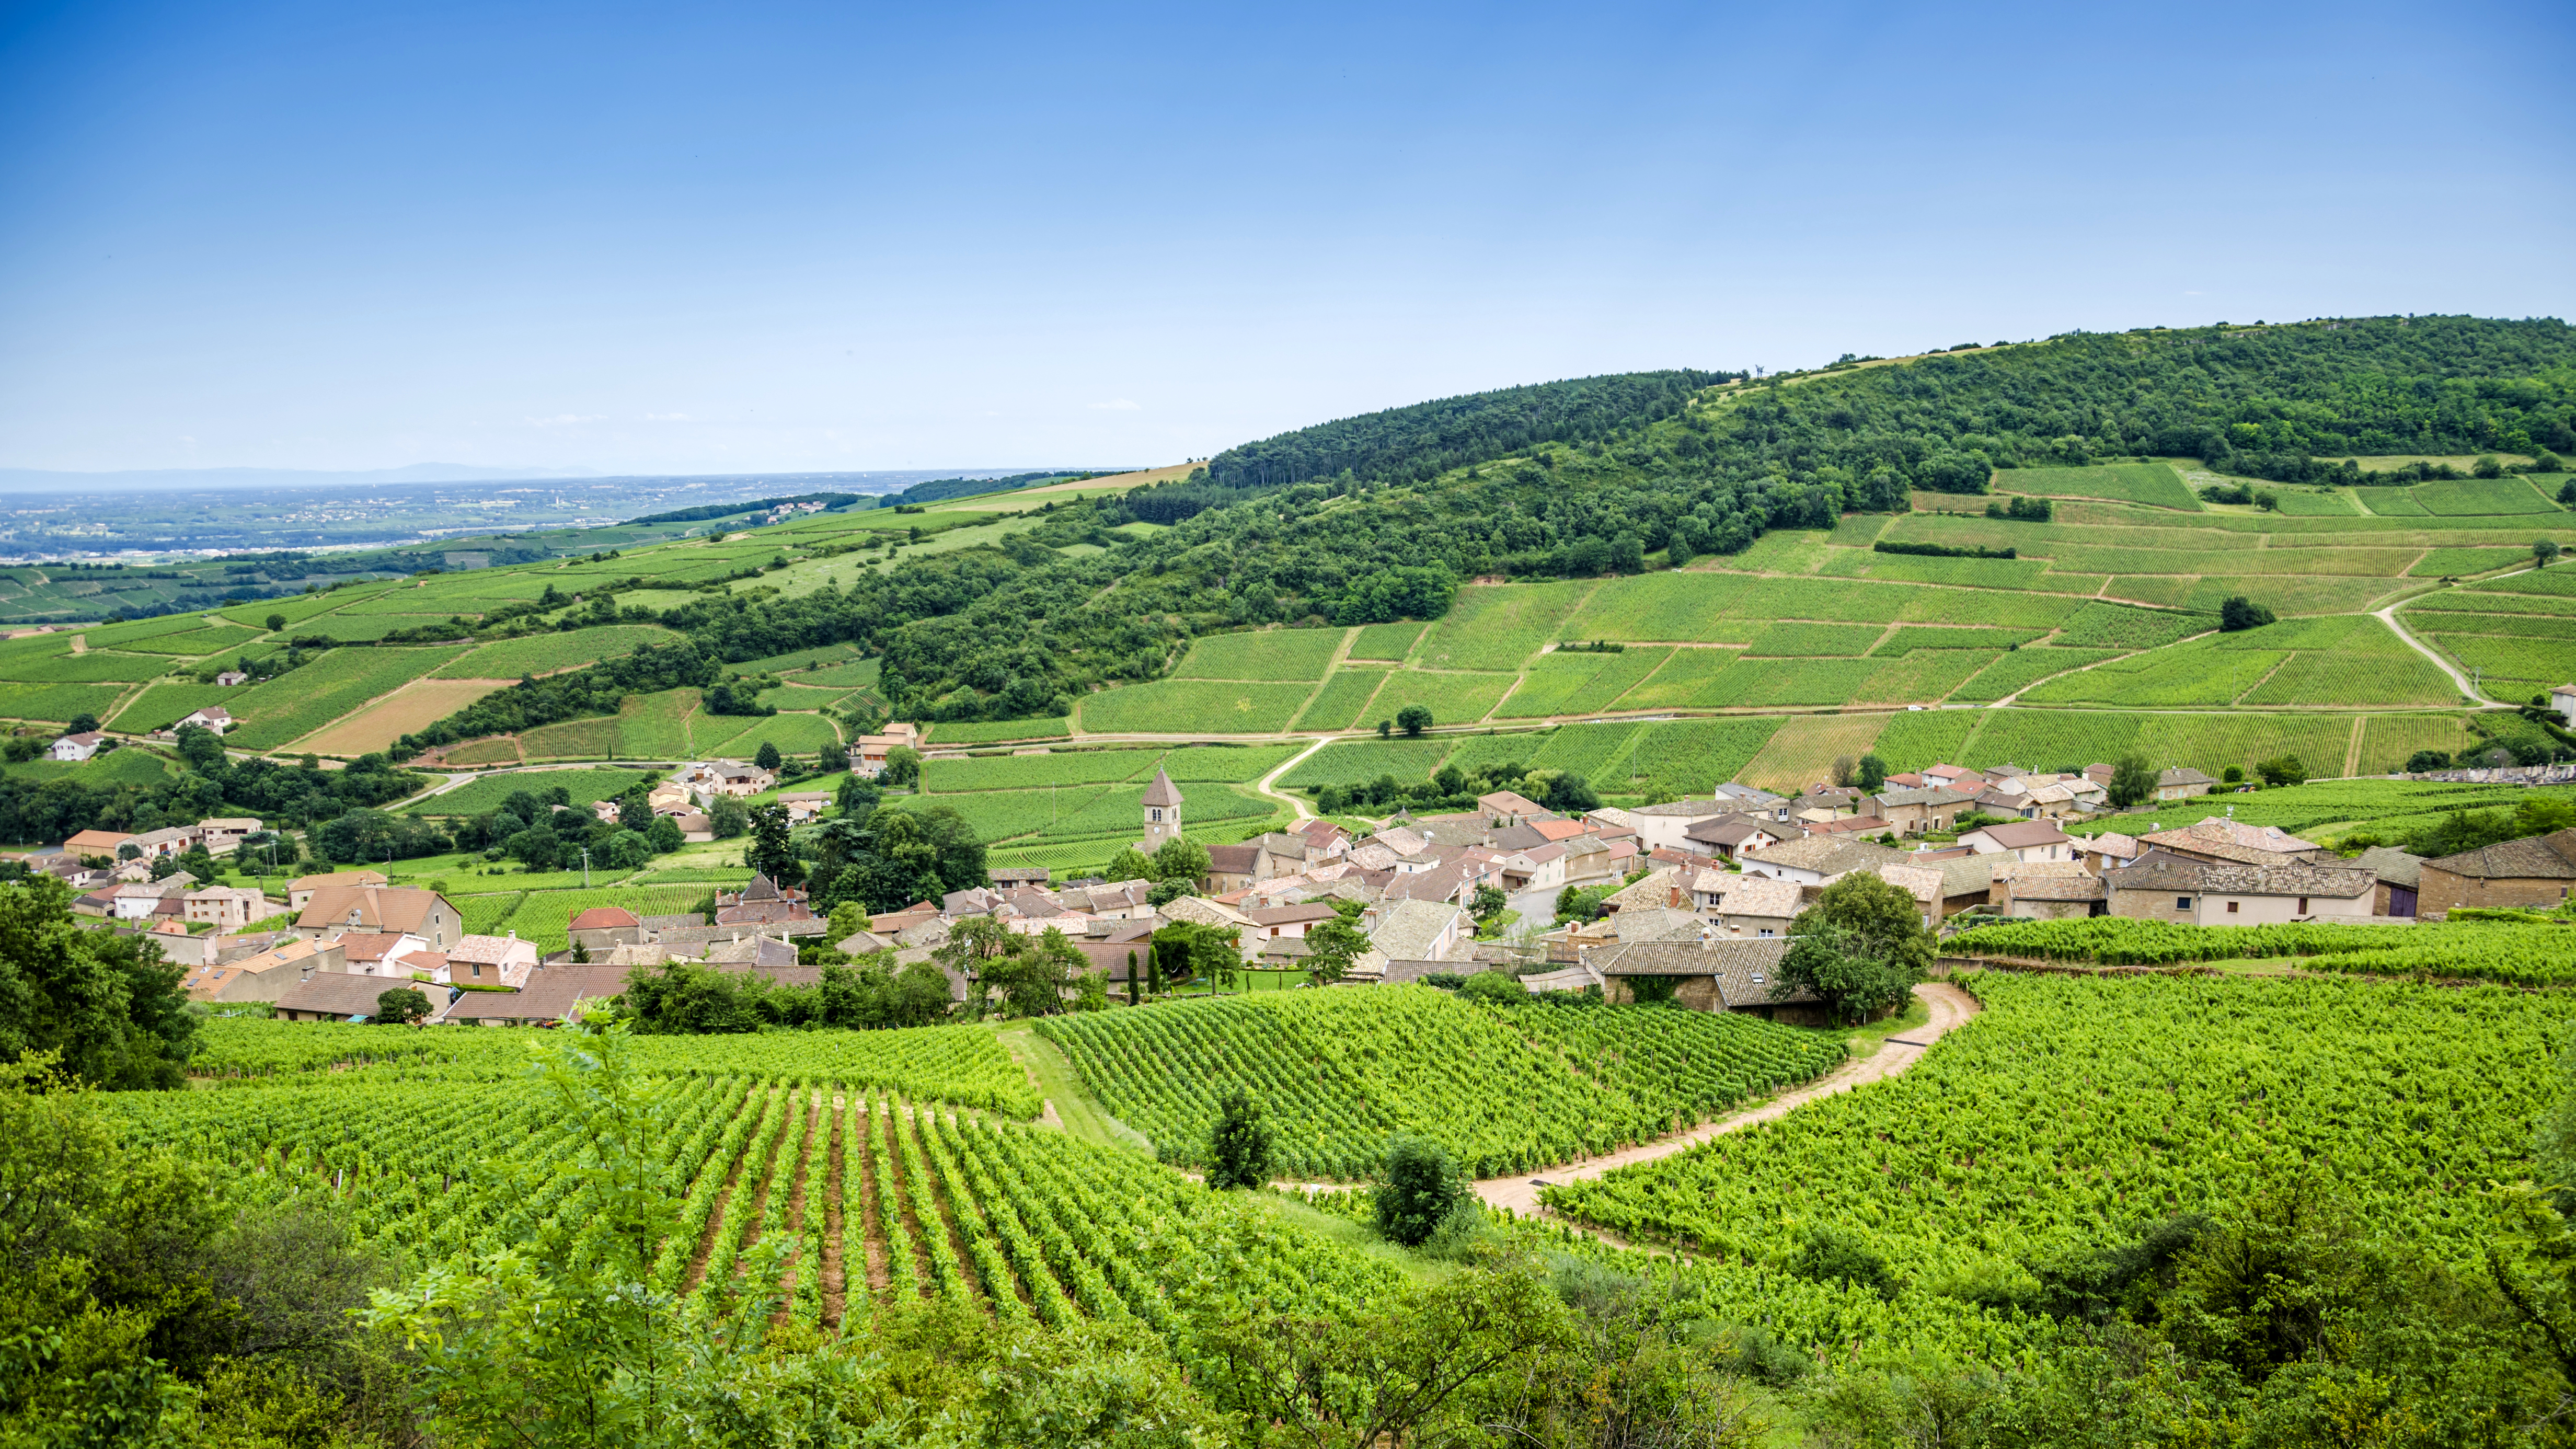 00092f_france_burgundy_Wine-Village-4575c77963fa7278cf55687134825c0c